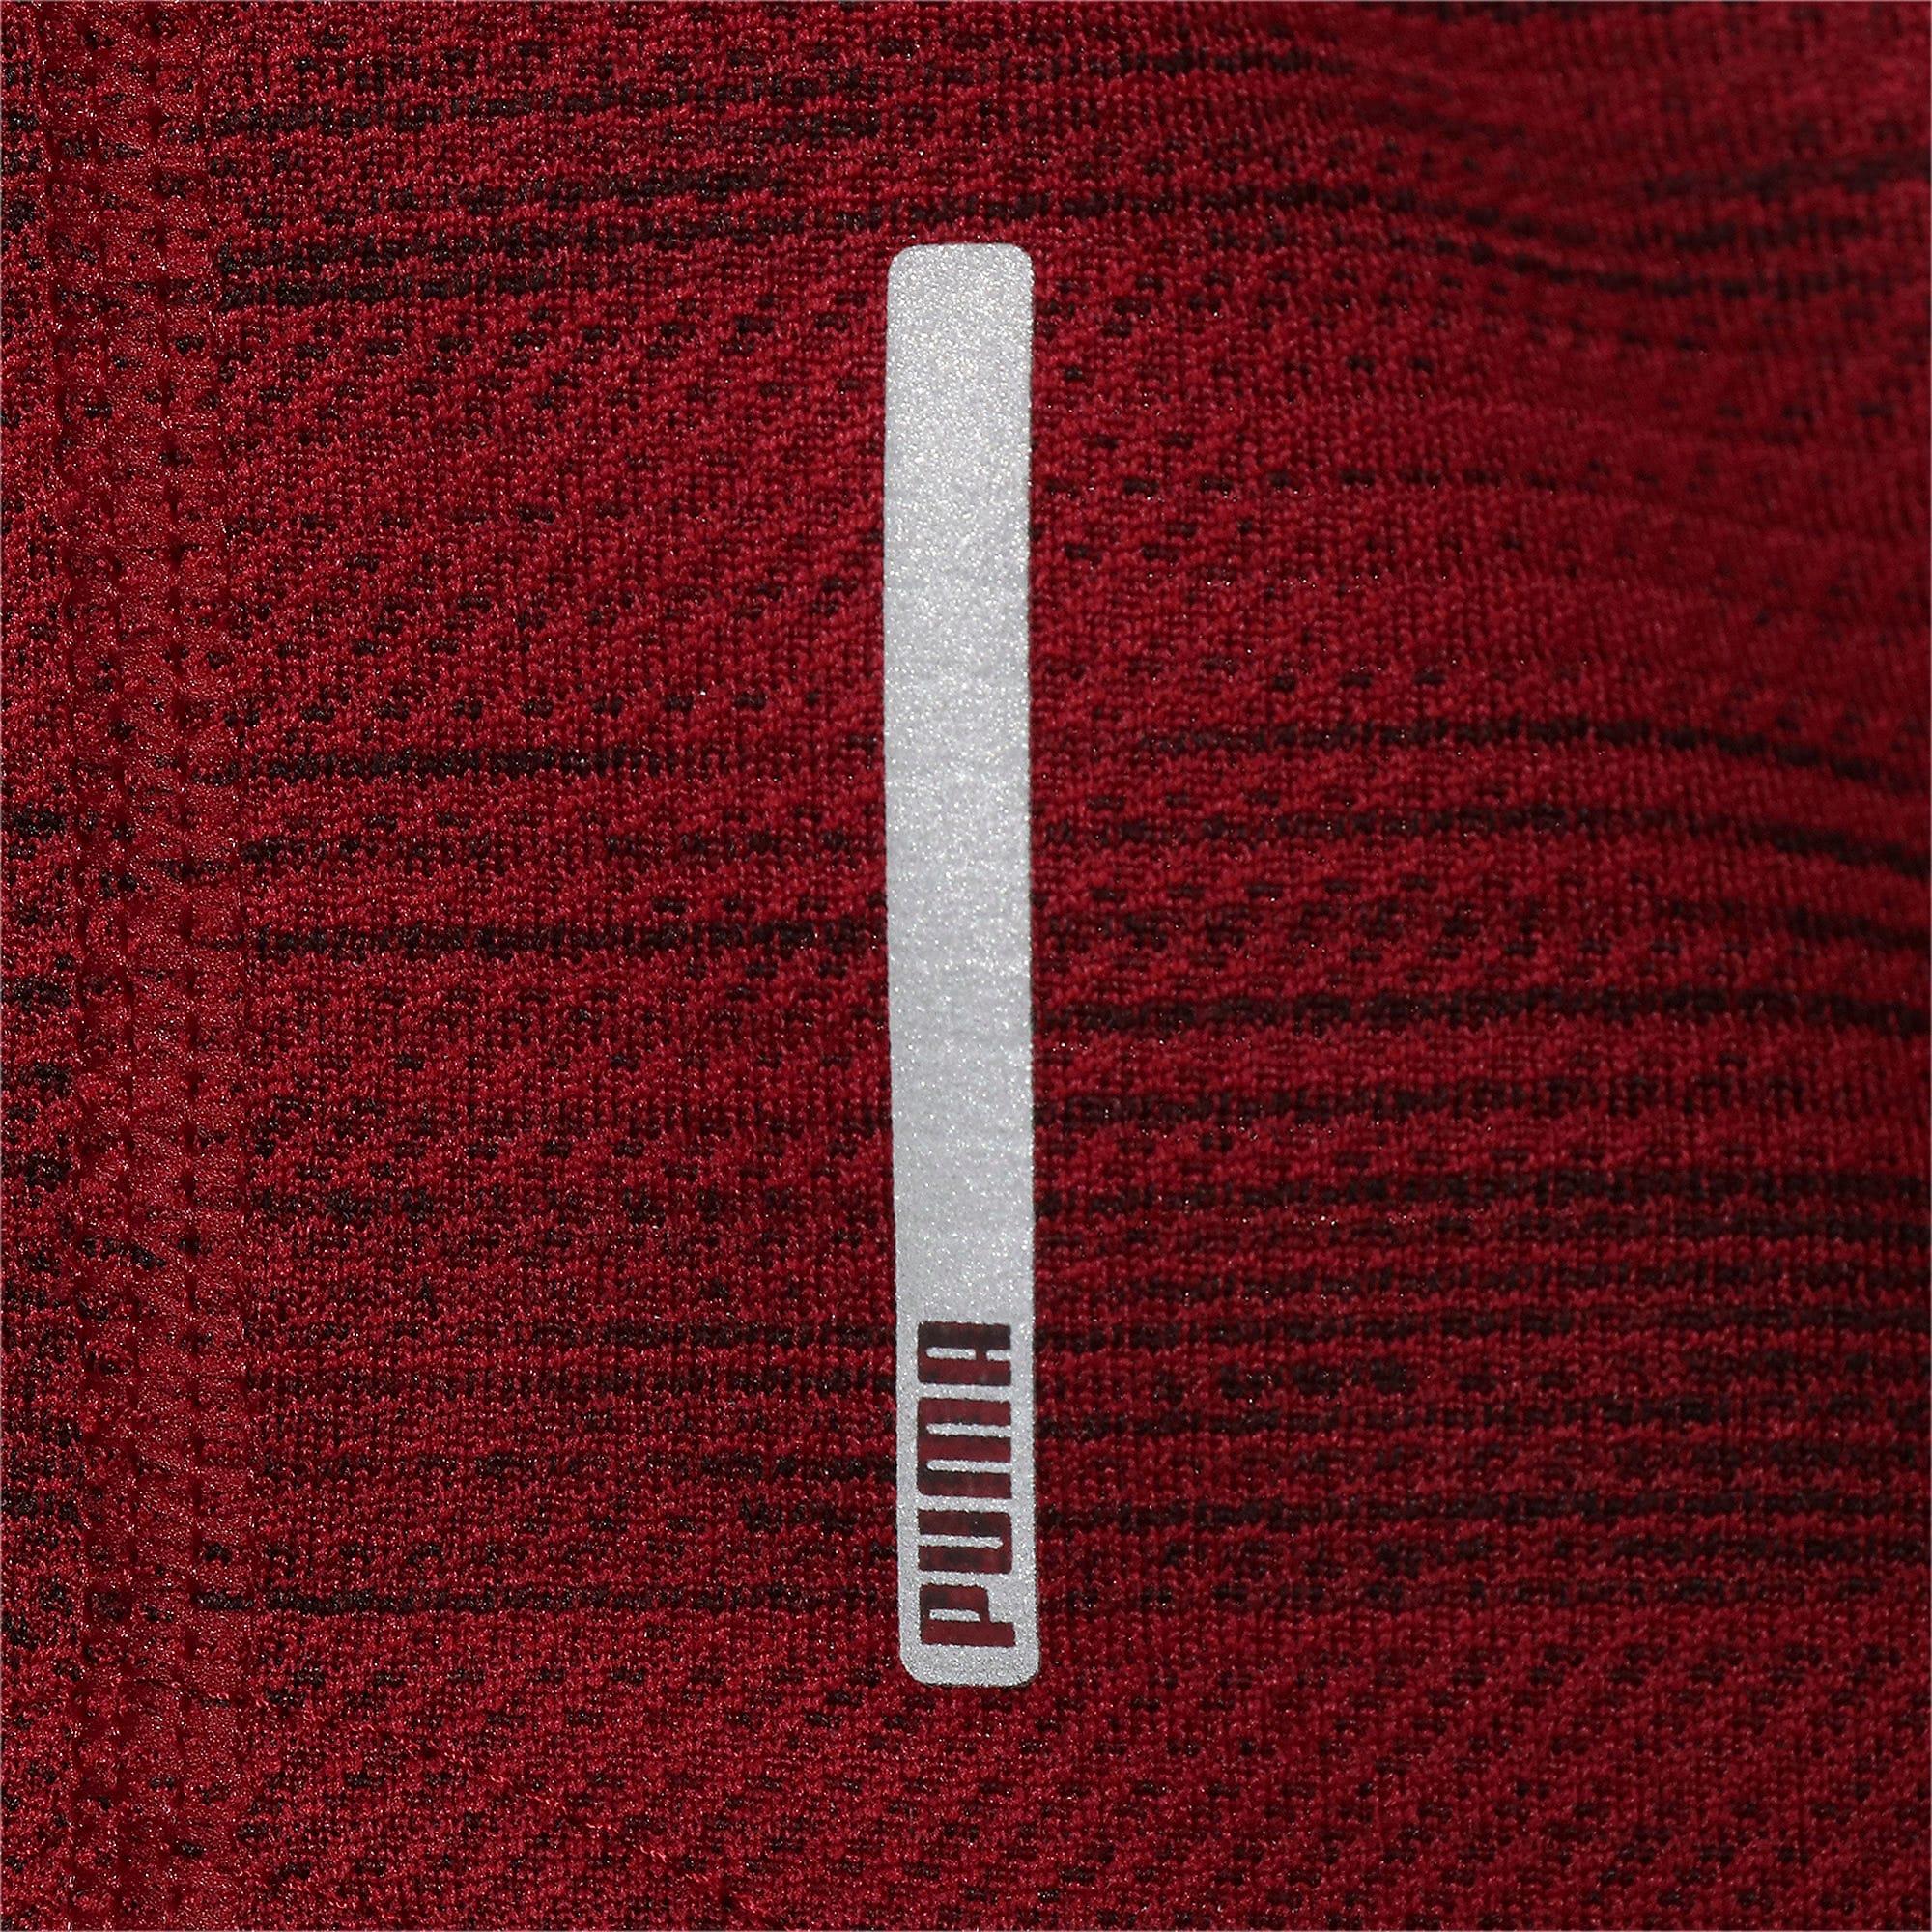 Thumbnail 11 of LAST LAP ヘザー SS ランニング Tシャツ 半袖, Rhubarb Heather, medium-JPN